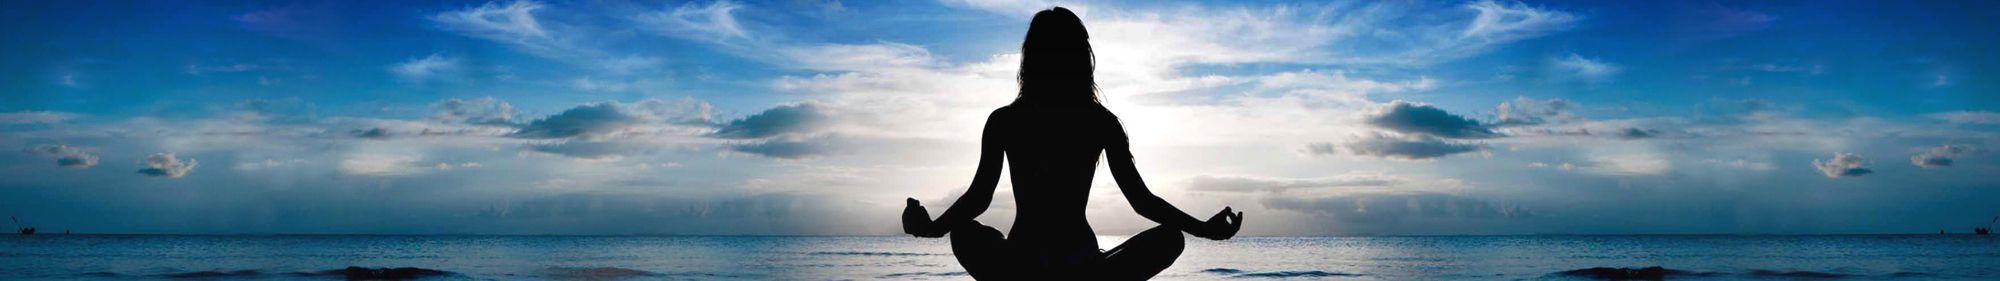 Disconnect To Reconnect Florida Zen Den Yoga School And Retreat Center